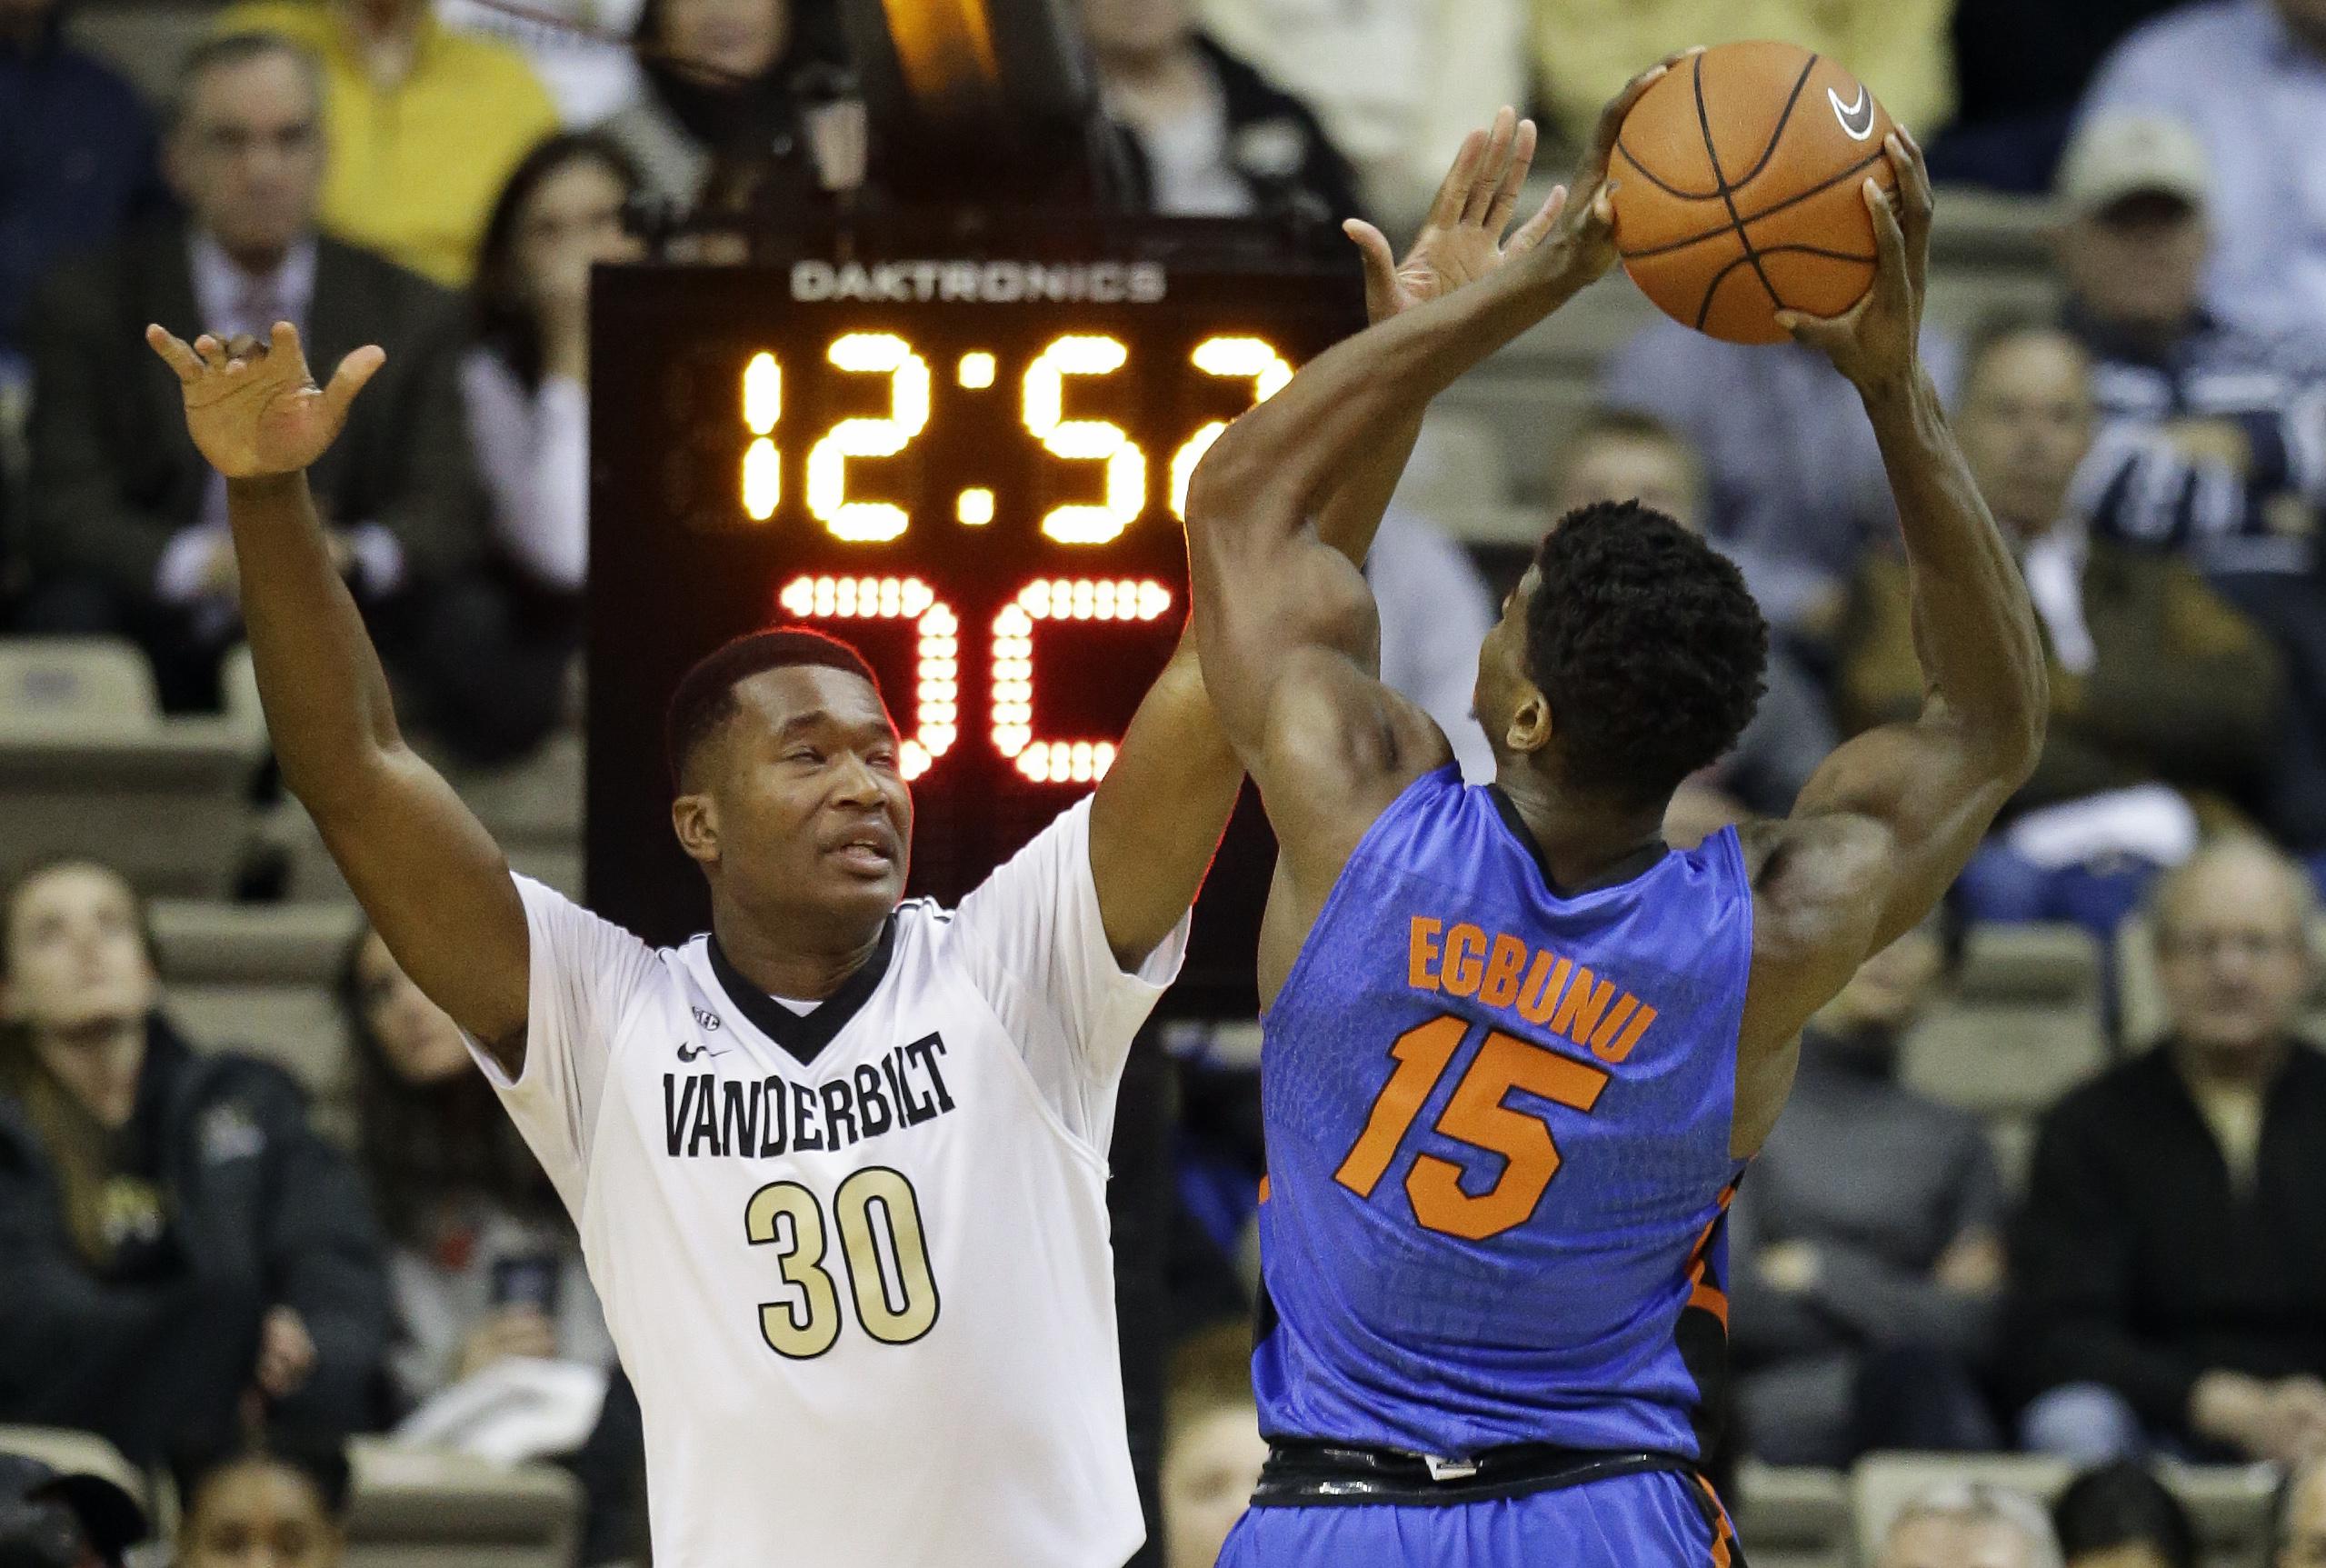 Vanderbilt center Damian Jones (30) defends against Florida center John Egbunu (15) in the first half of an NCAA college basketball game Tuesday, Jan. 26, 2016, in Nashville, Tenn. (AP Photo/Mark Humphrey)